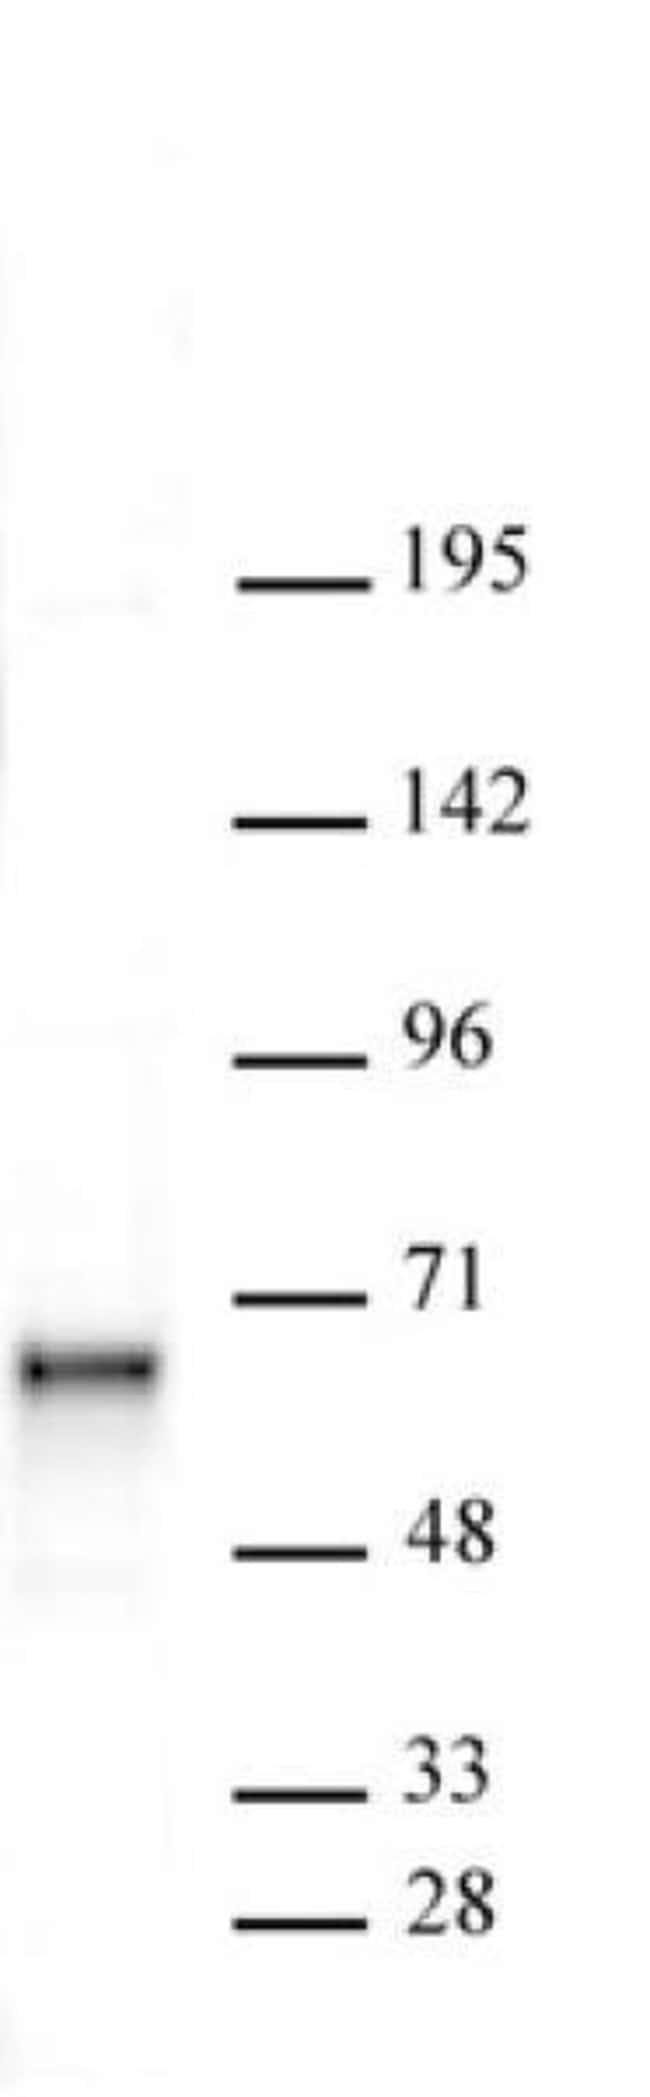 Sox11 Rabbit anti-Human, Unconjugated, Polyclonal, Active Motif:Antibodies:Primary